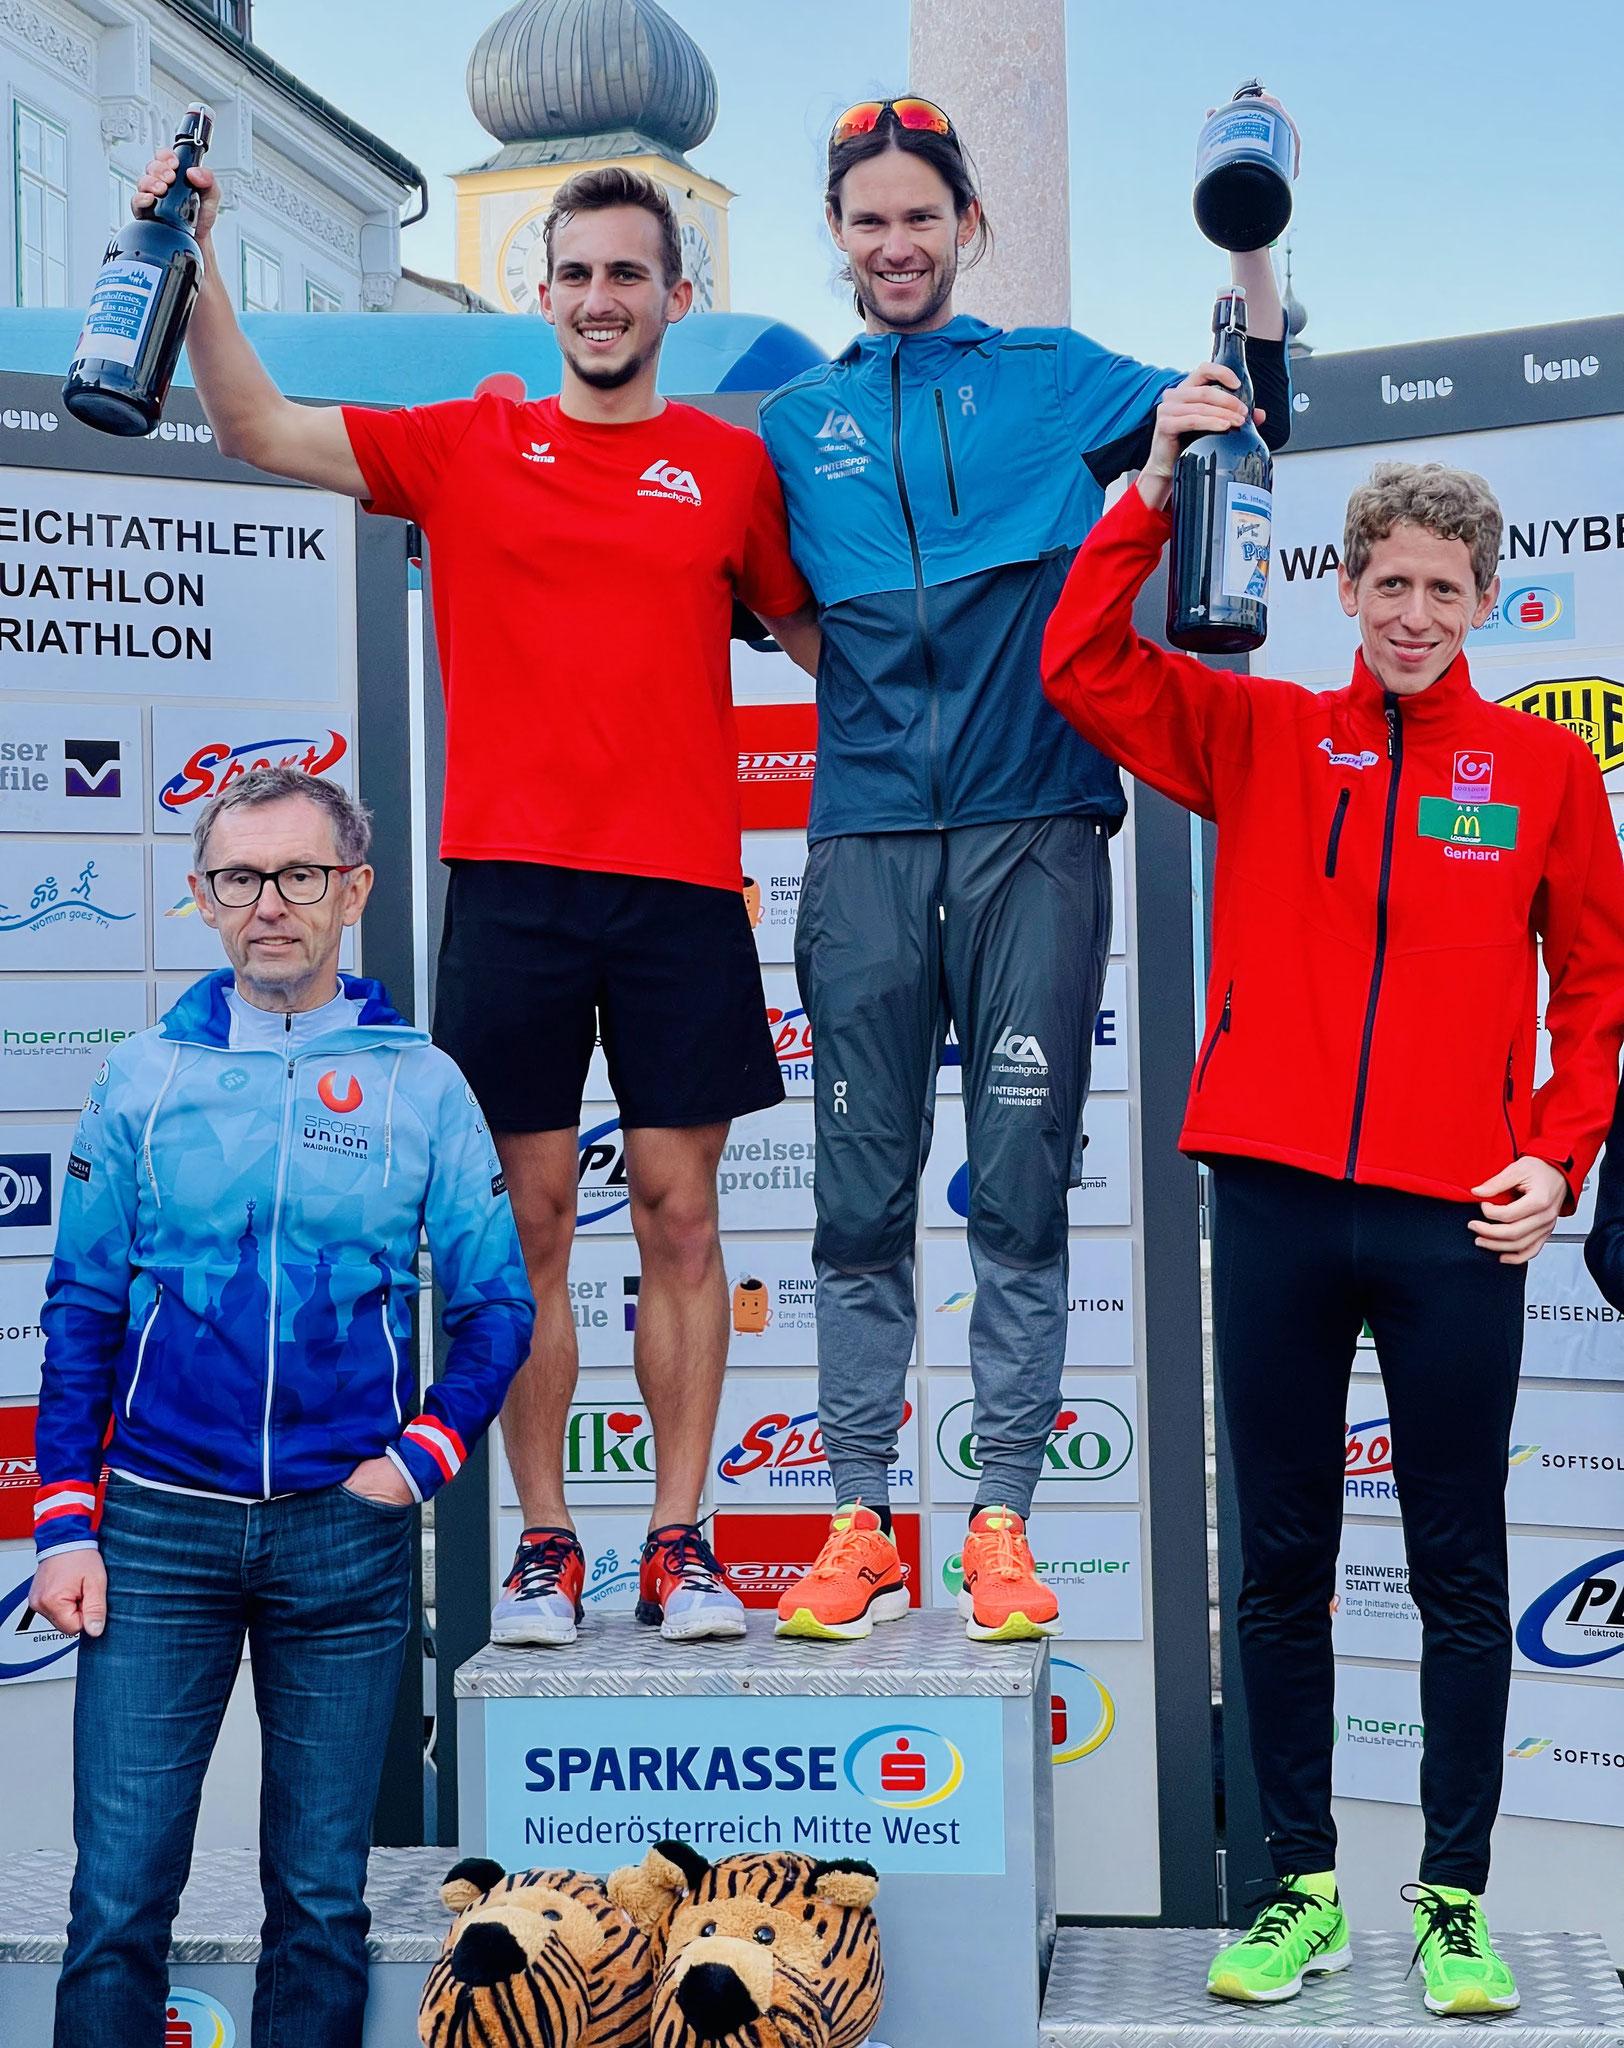 Gerhard holt den Gesamt 3. Platz! Super Leistung